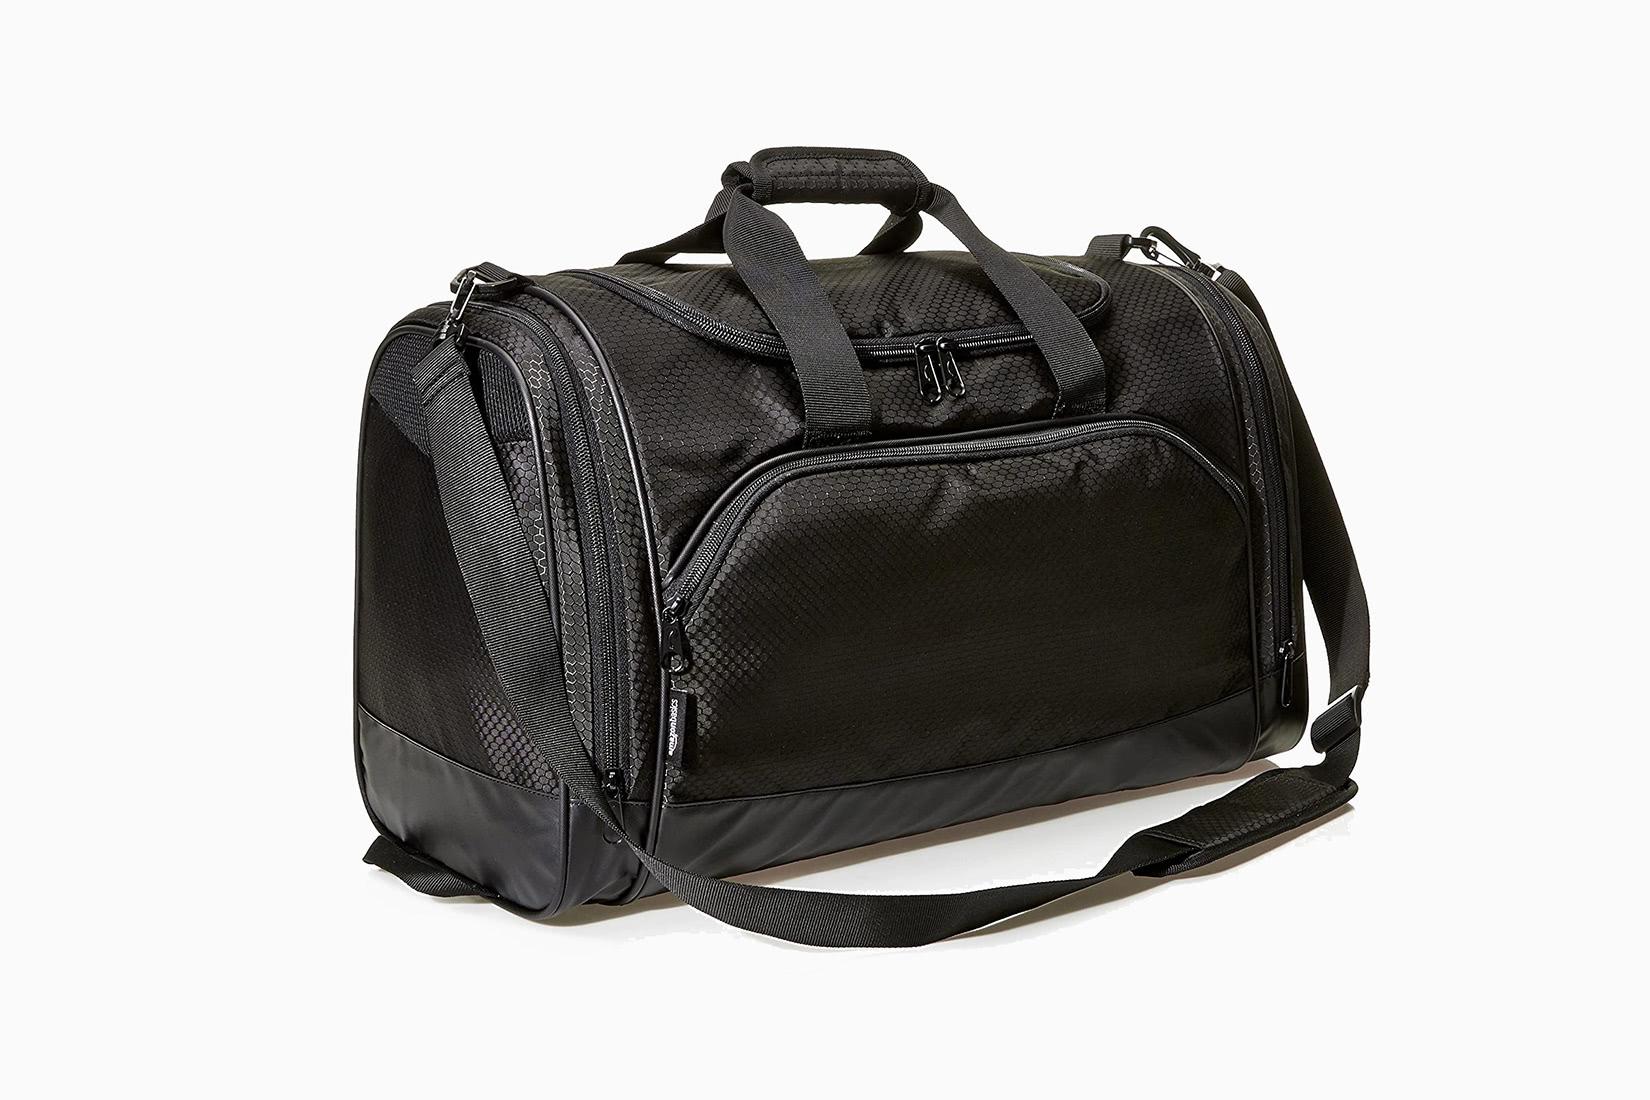 best men gym bag budget amazonbasics - Luxe Digital